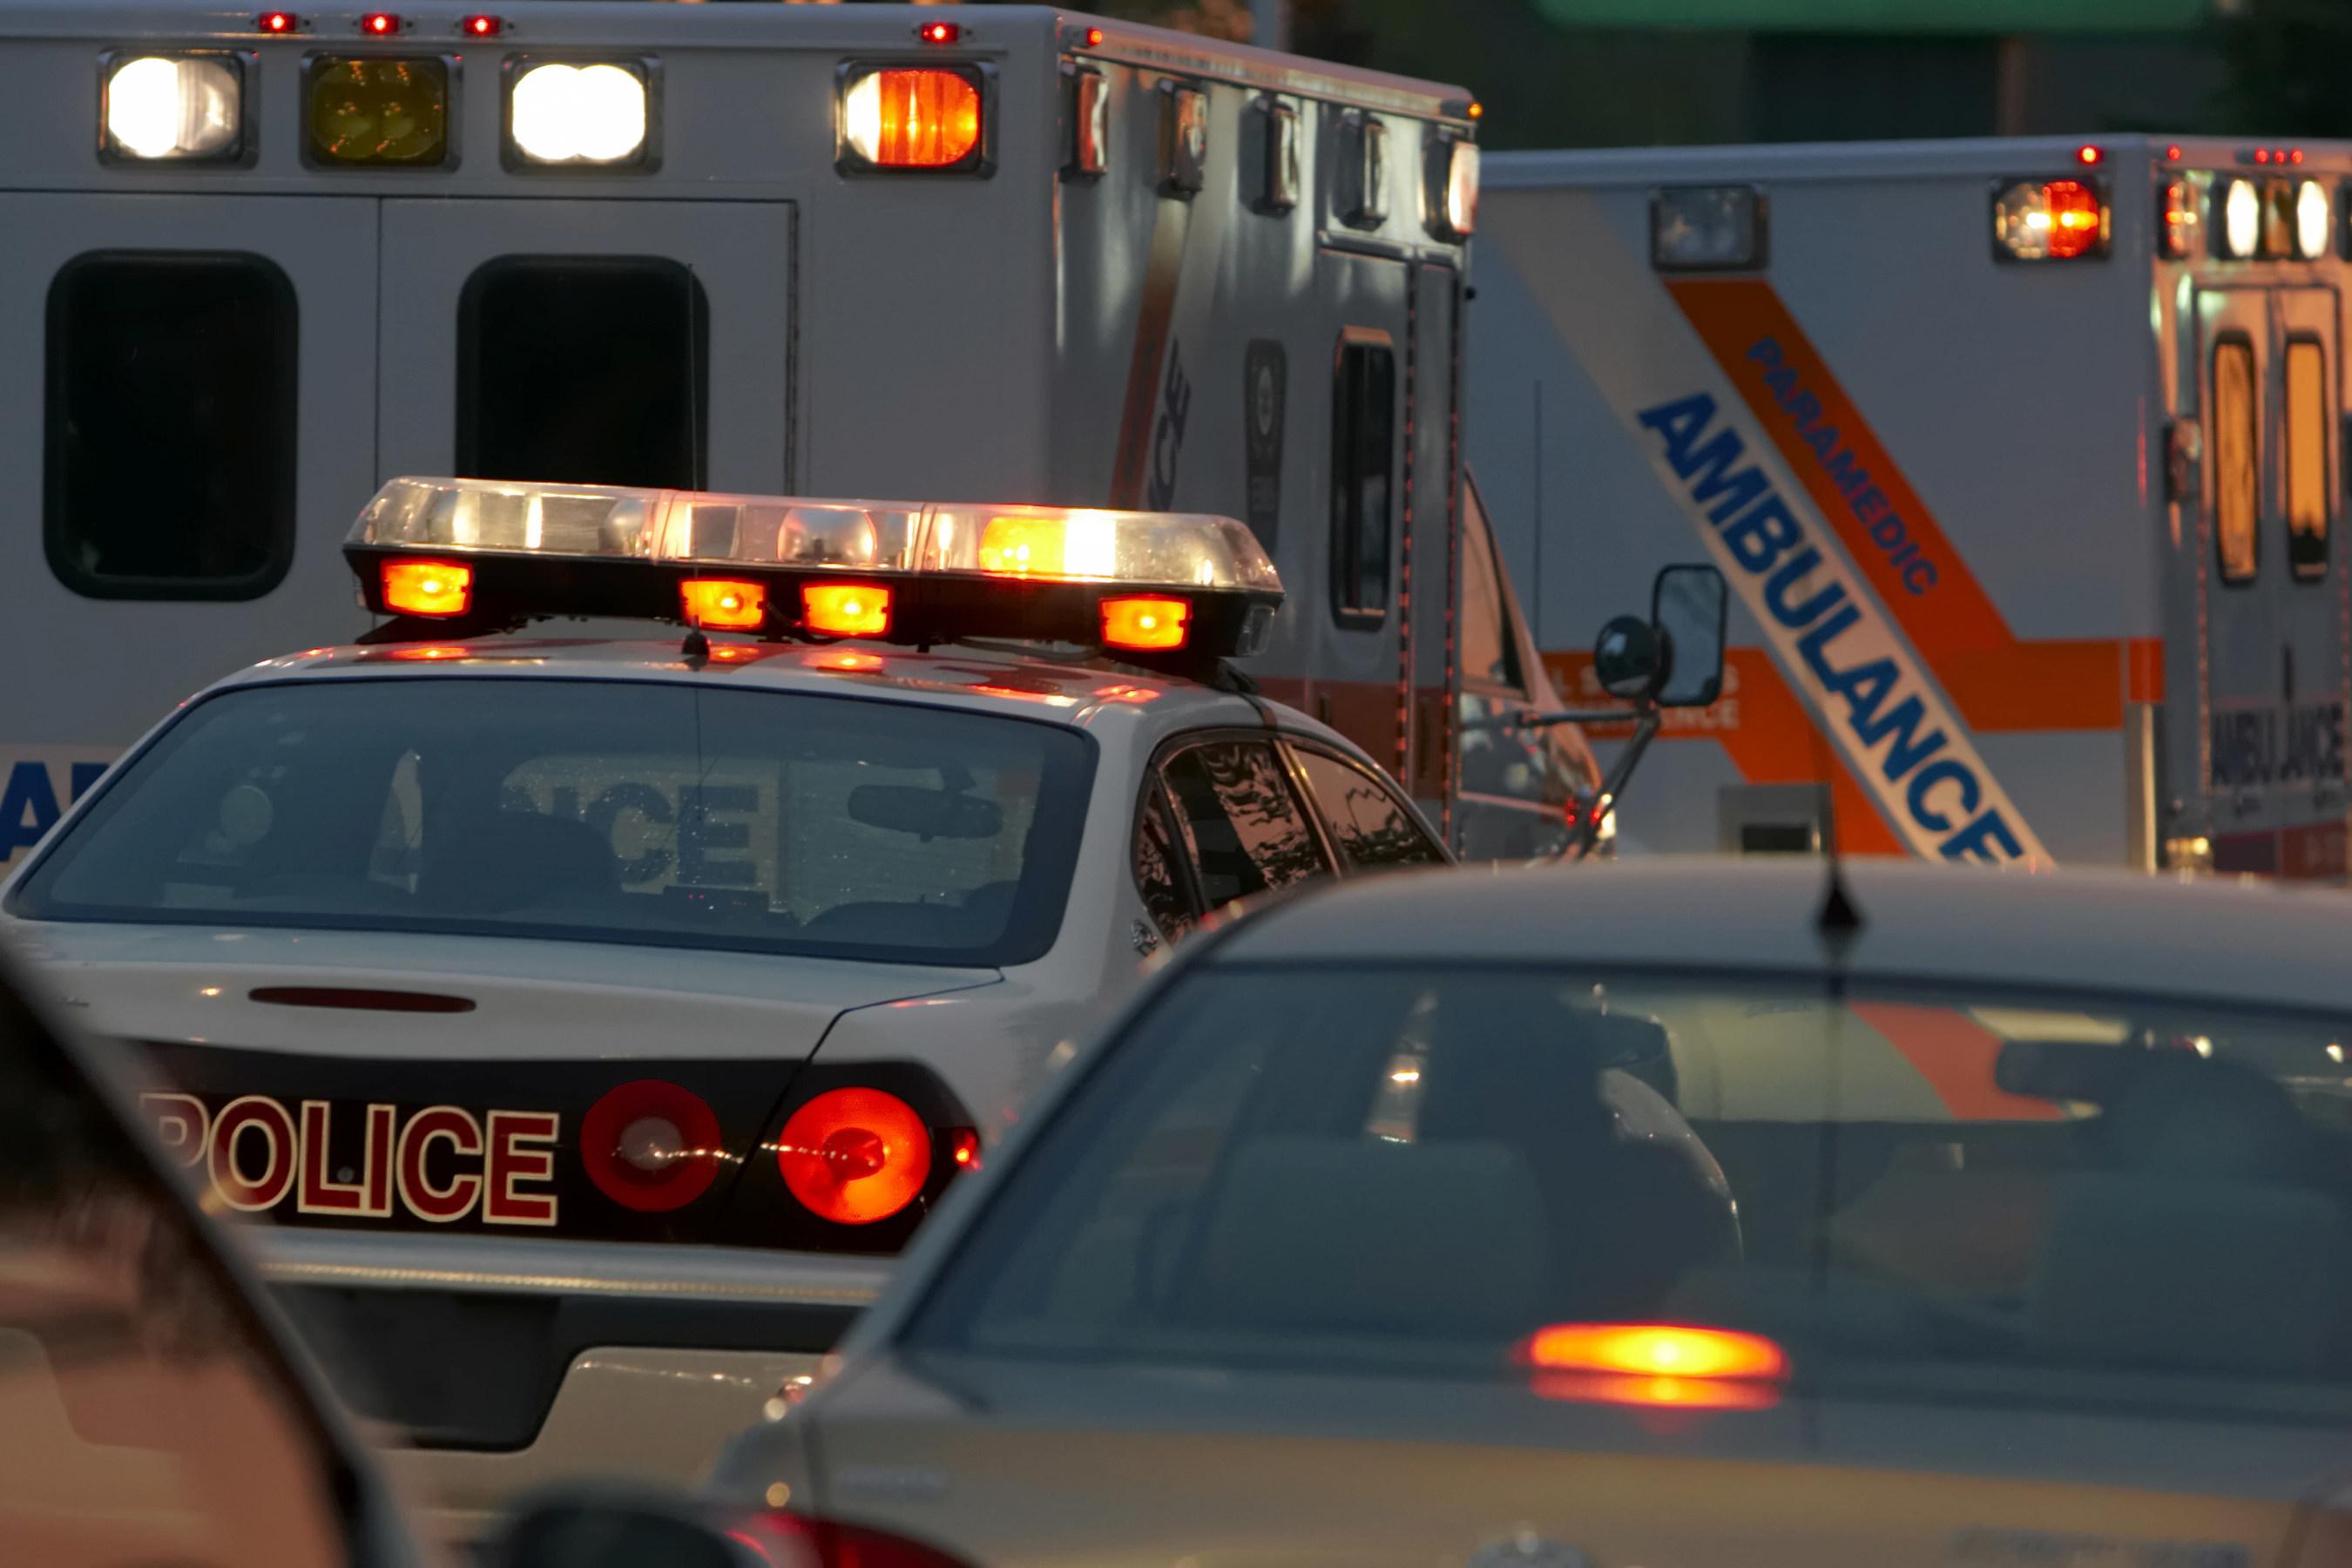 First responders on scene